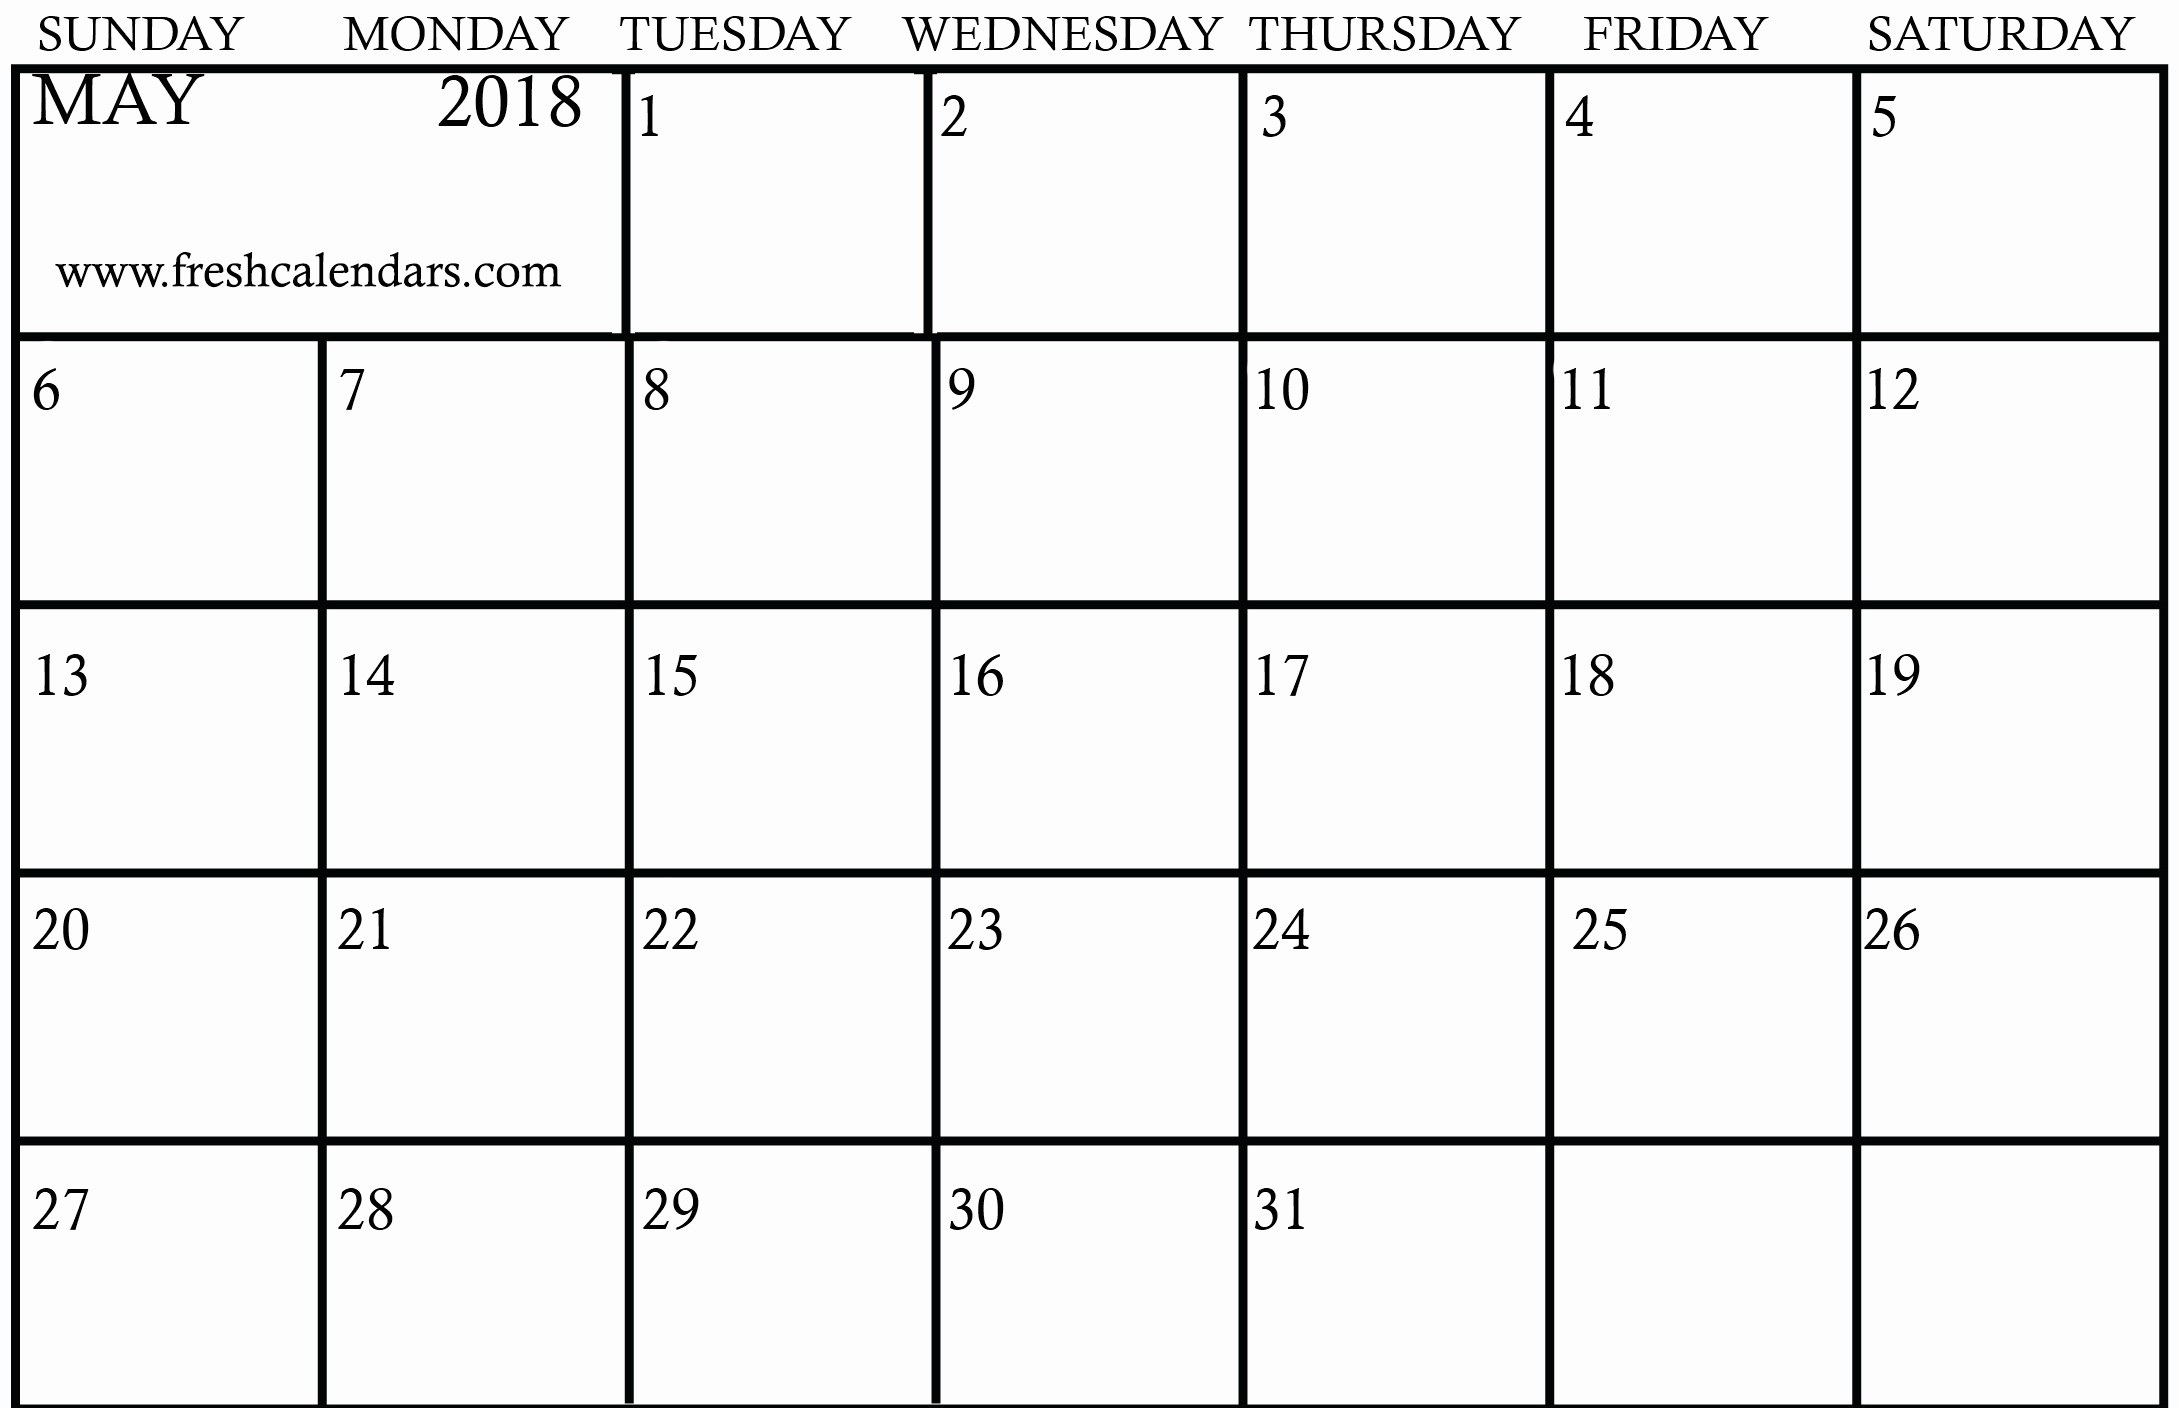 Blank May 2018 Calendar Printable Lovely Blank May 2018 Calendar Printable Templates